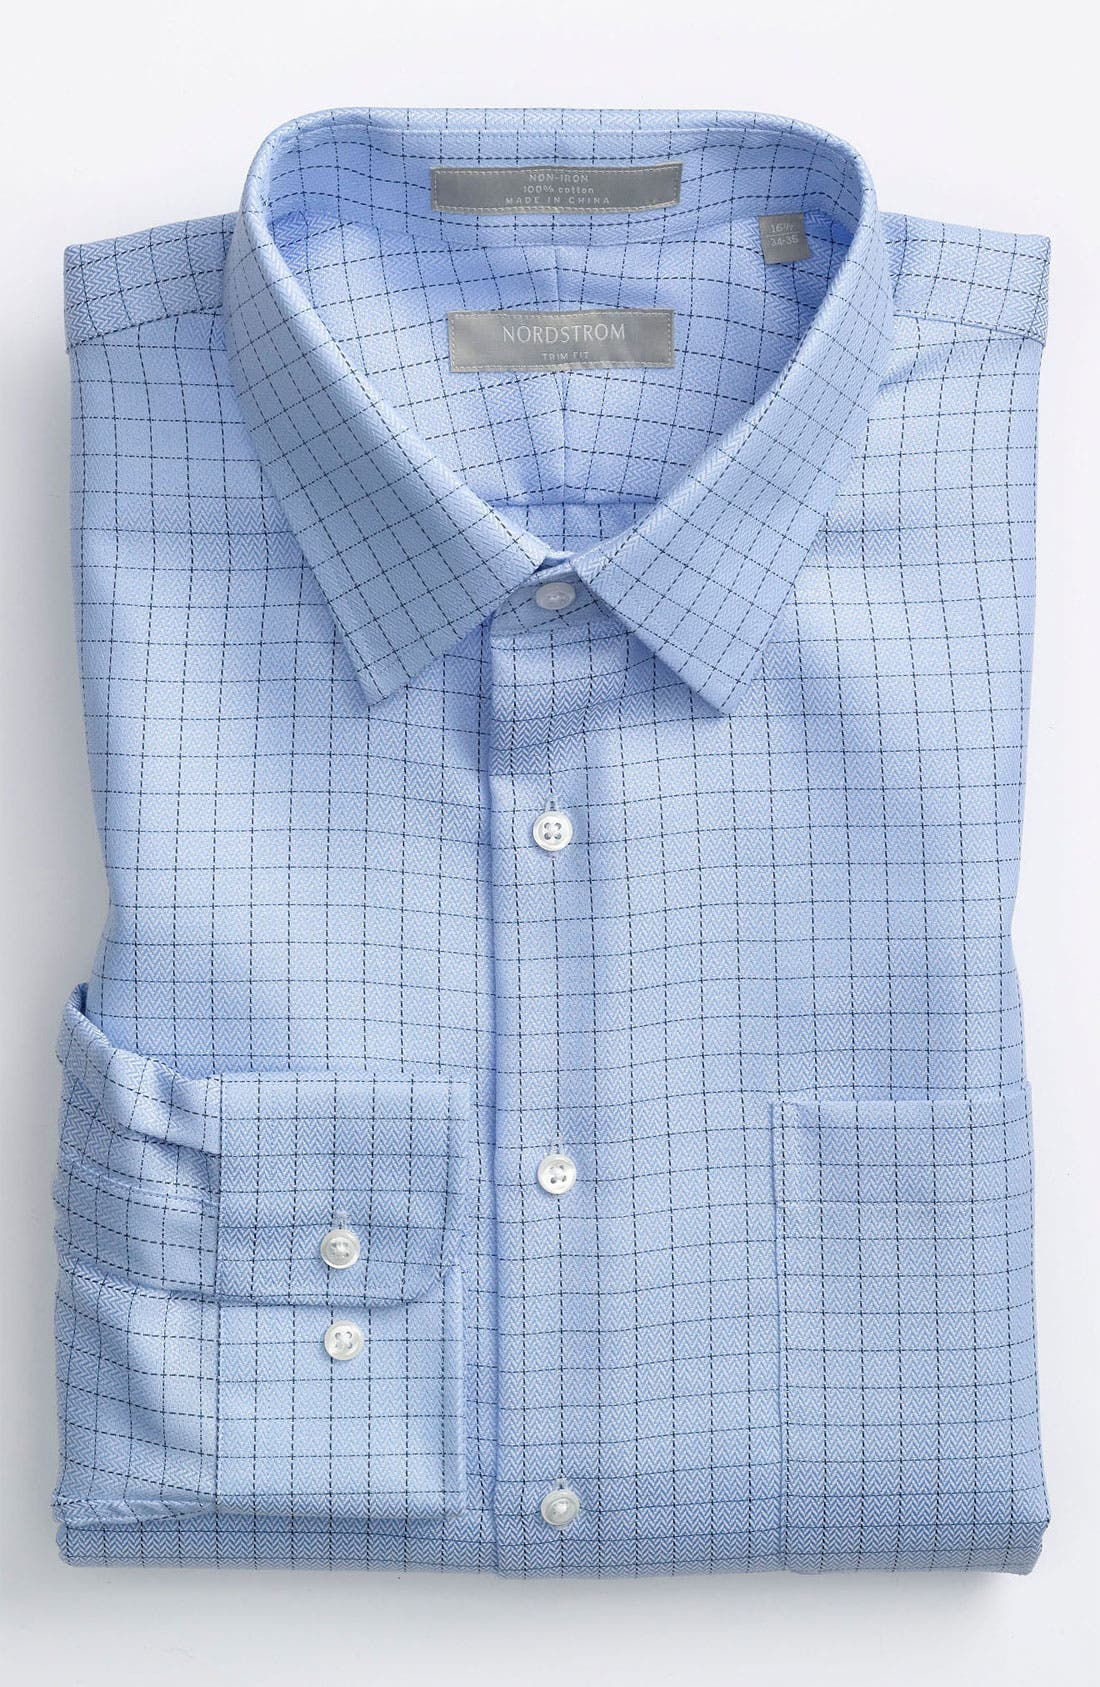 Main Image - Nordstrom Trim Fit Non-Iron Dress Shirt